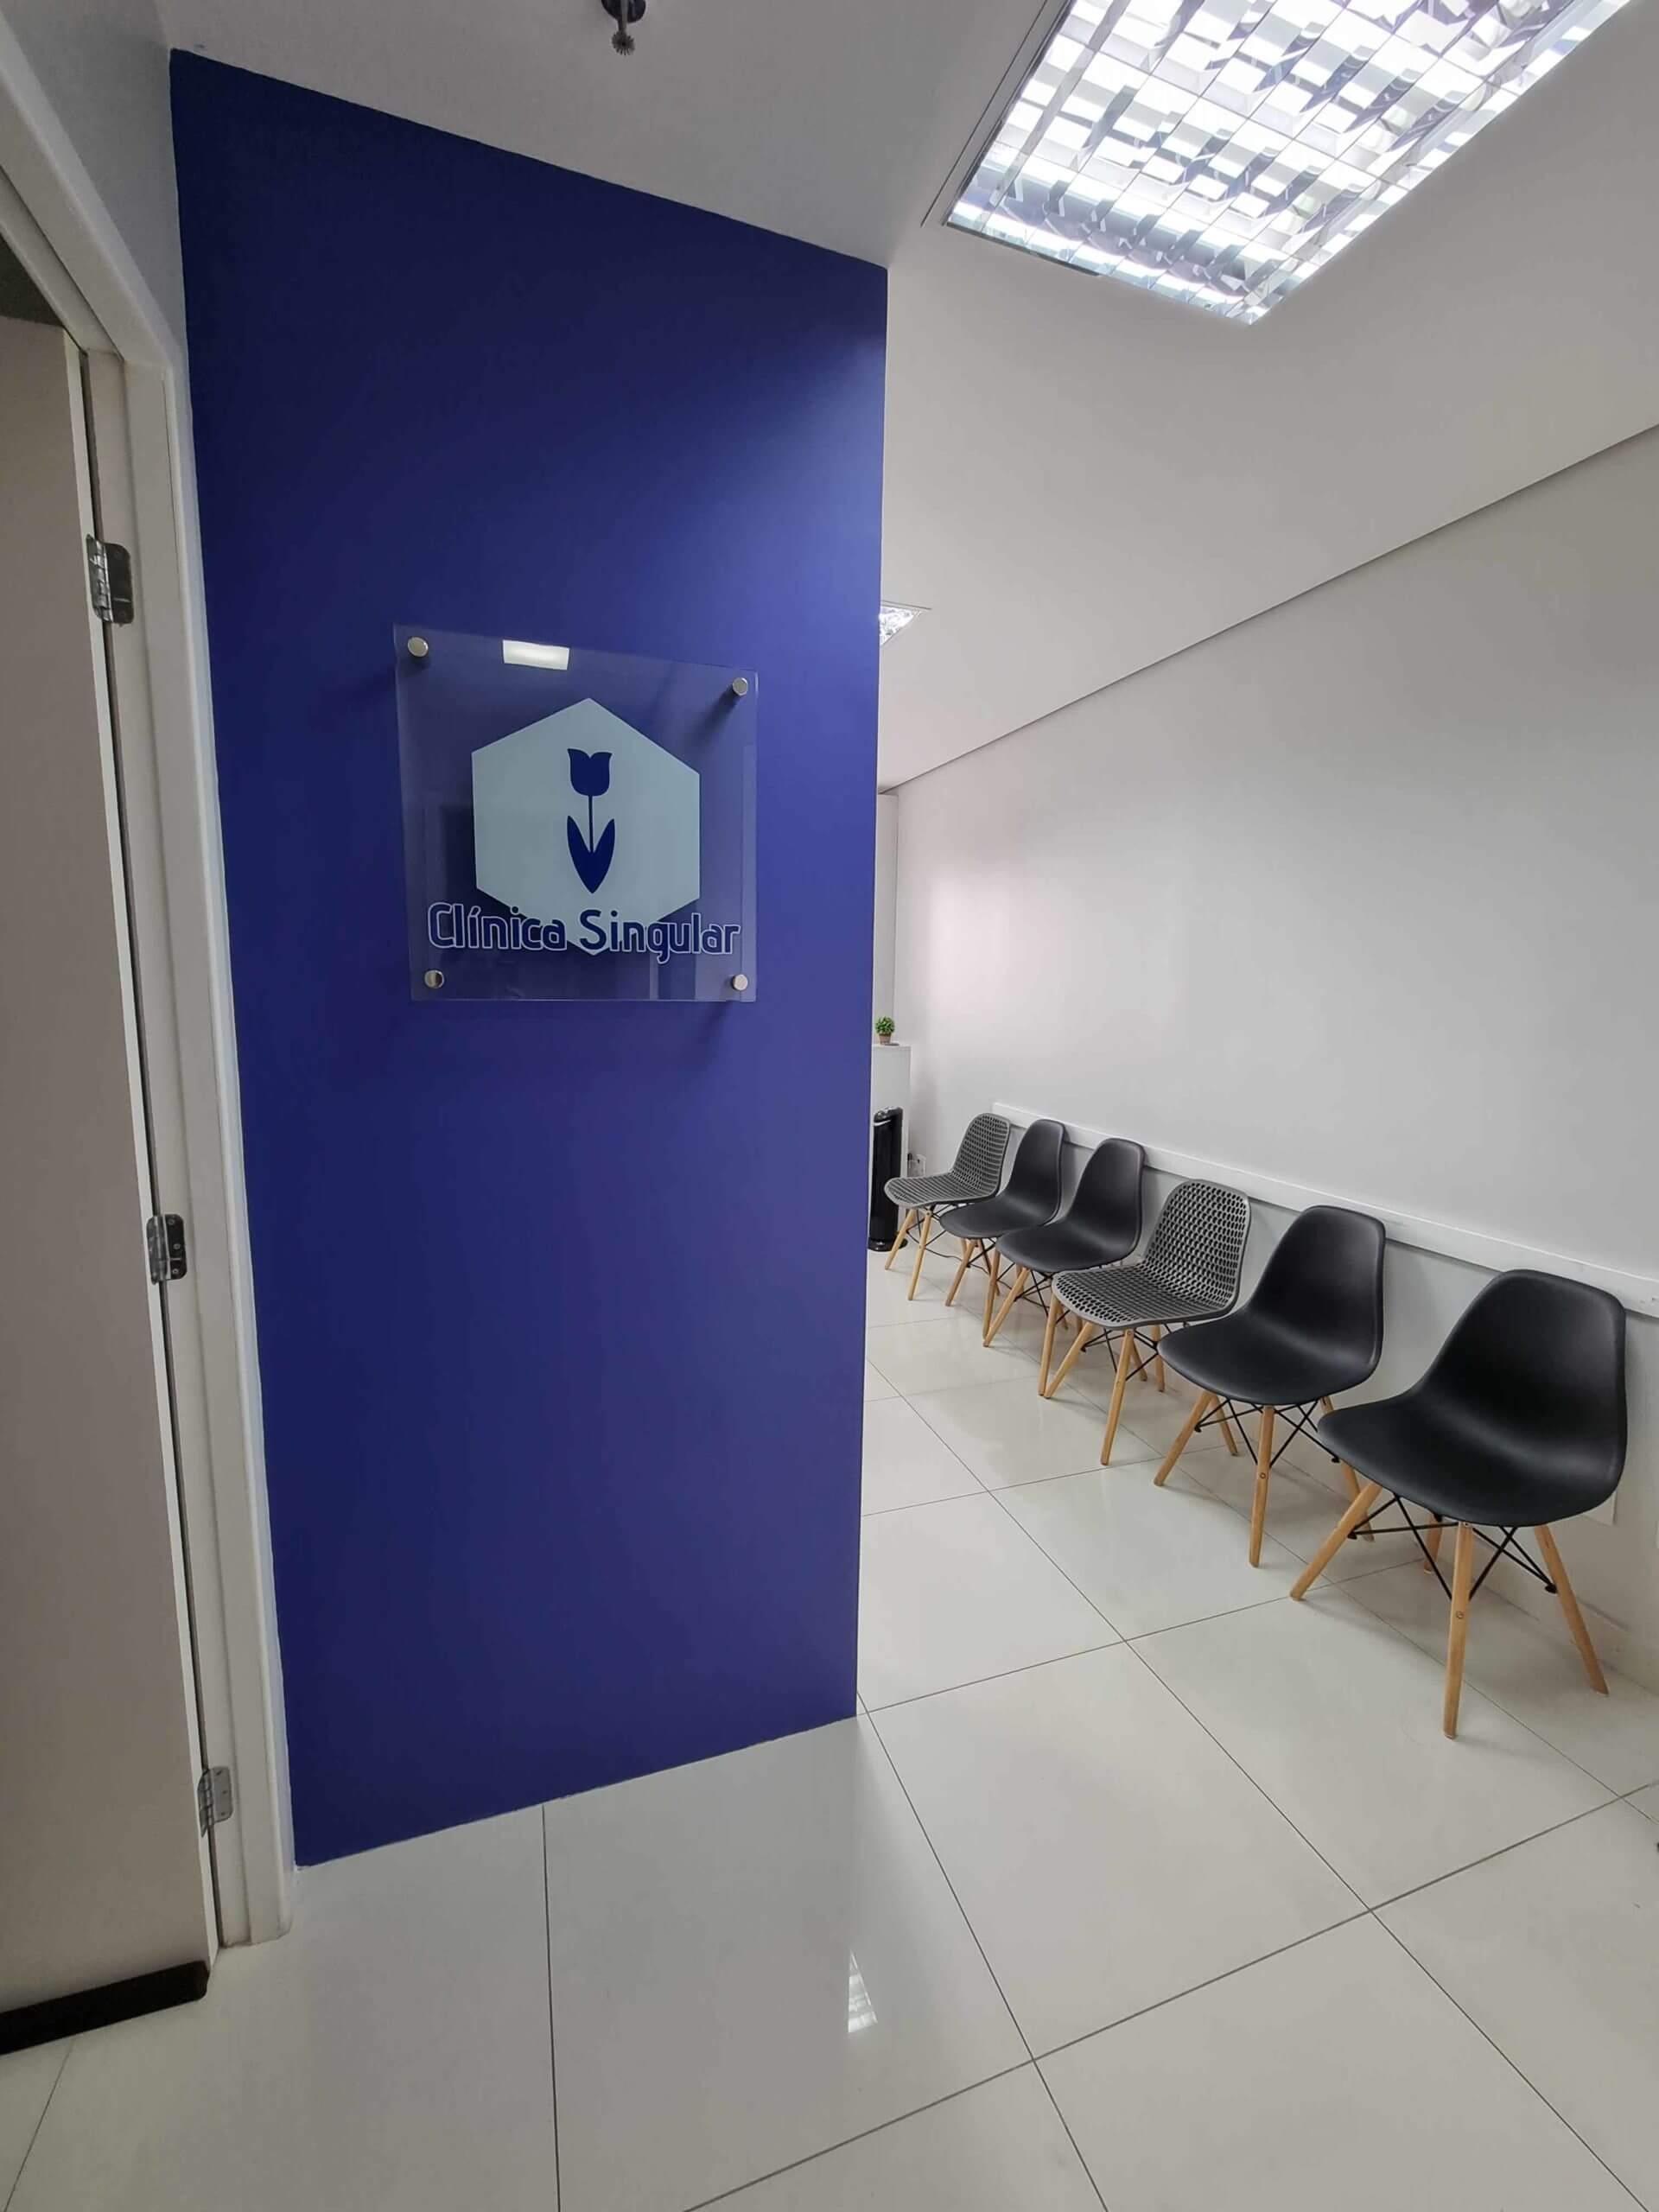 Clinica Singular Entrada 2